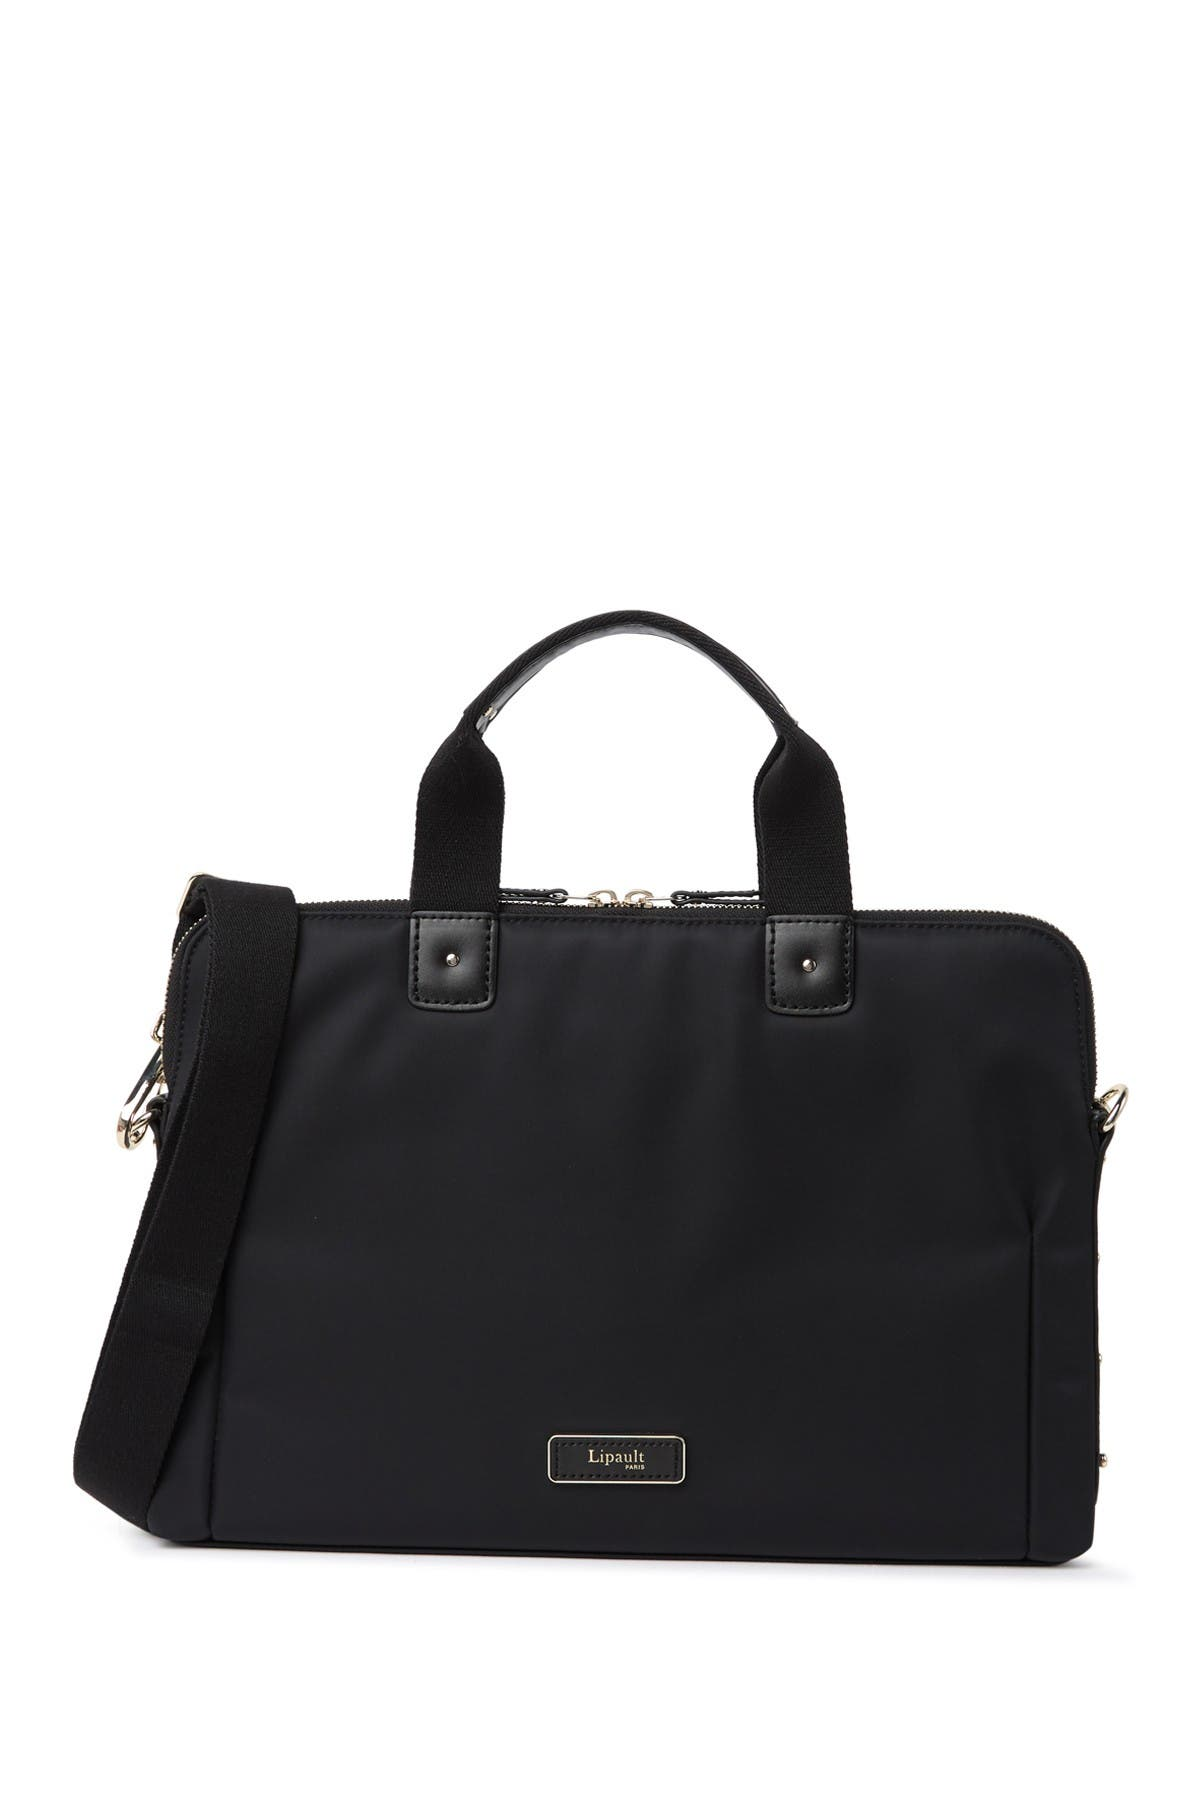 Image of Lipault Slim Laptop Bag